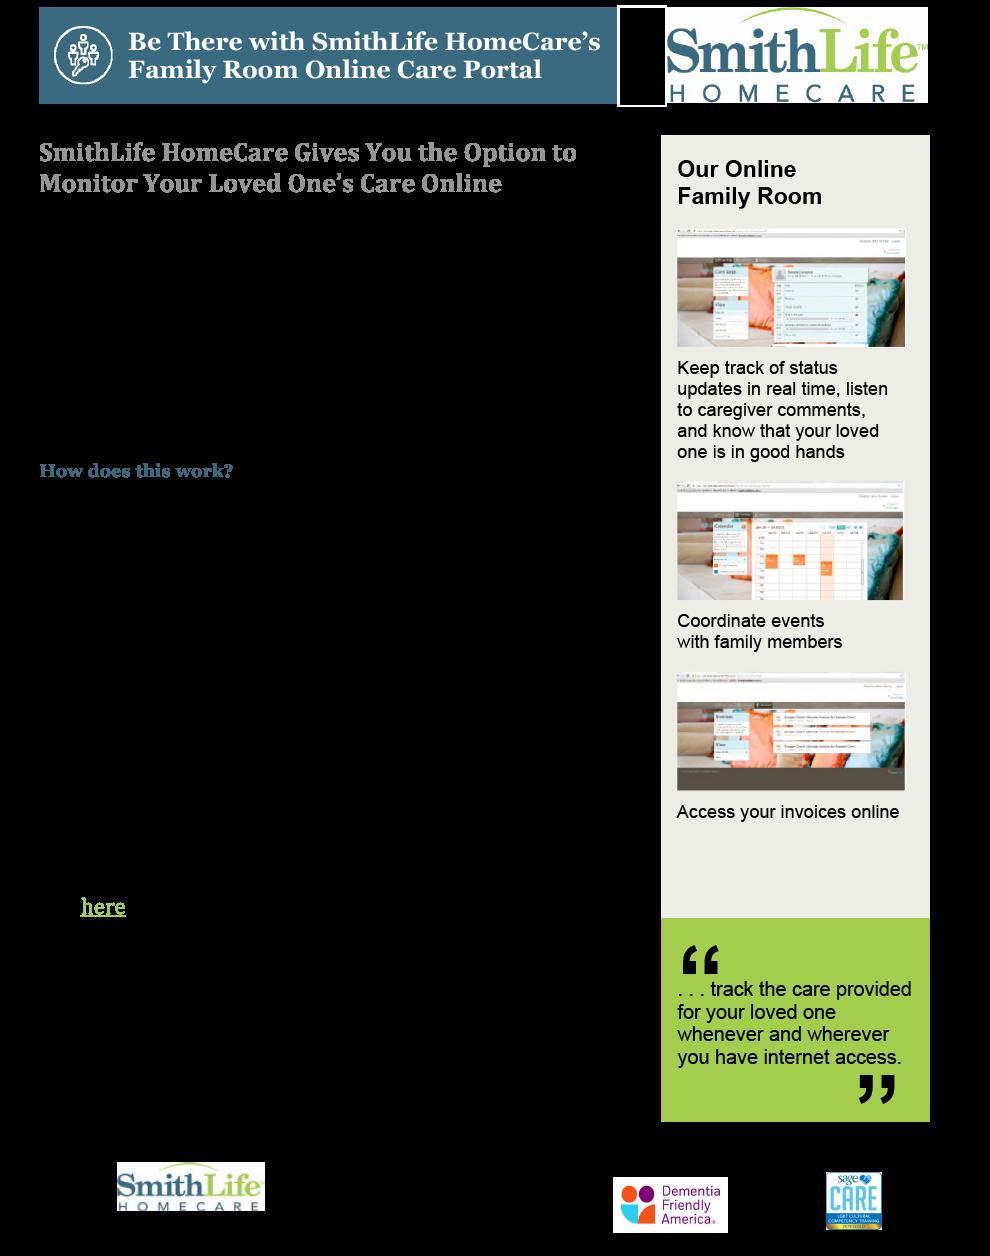 SmithLife information sheet